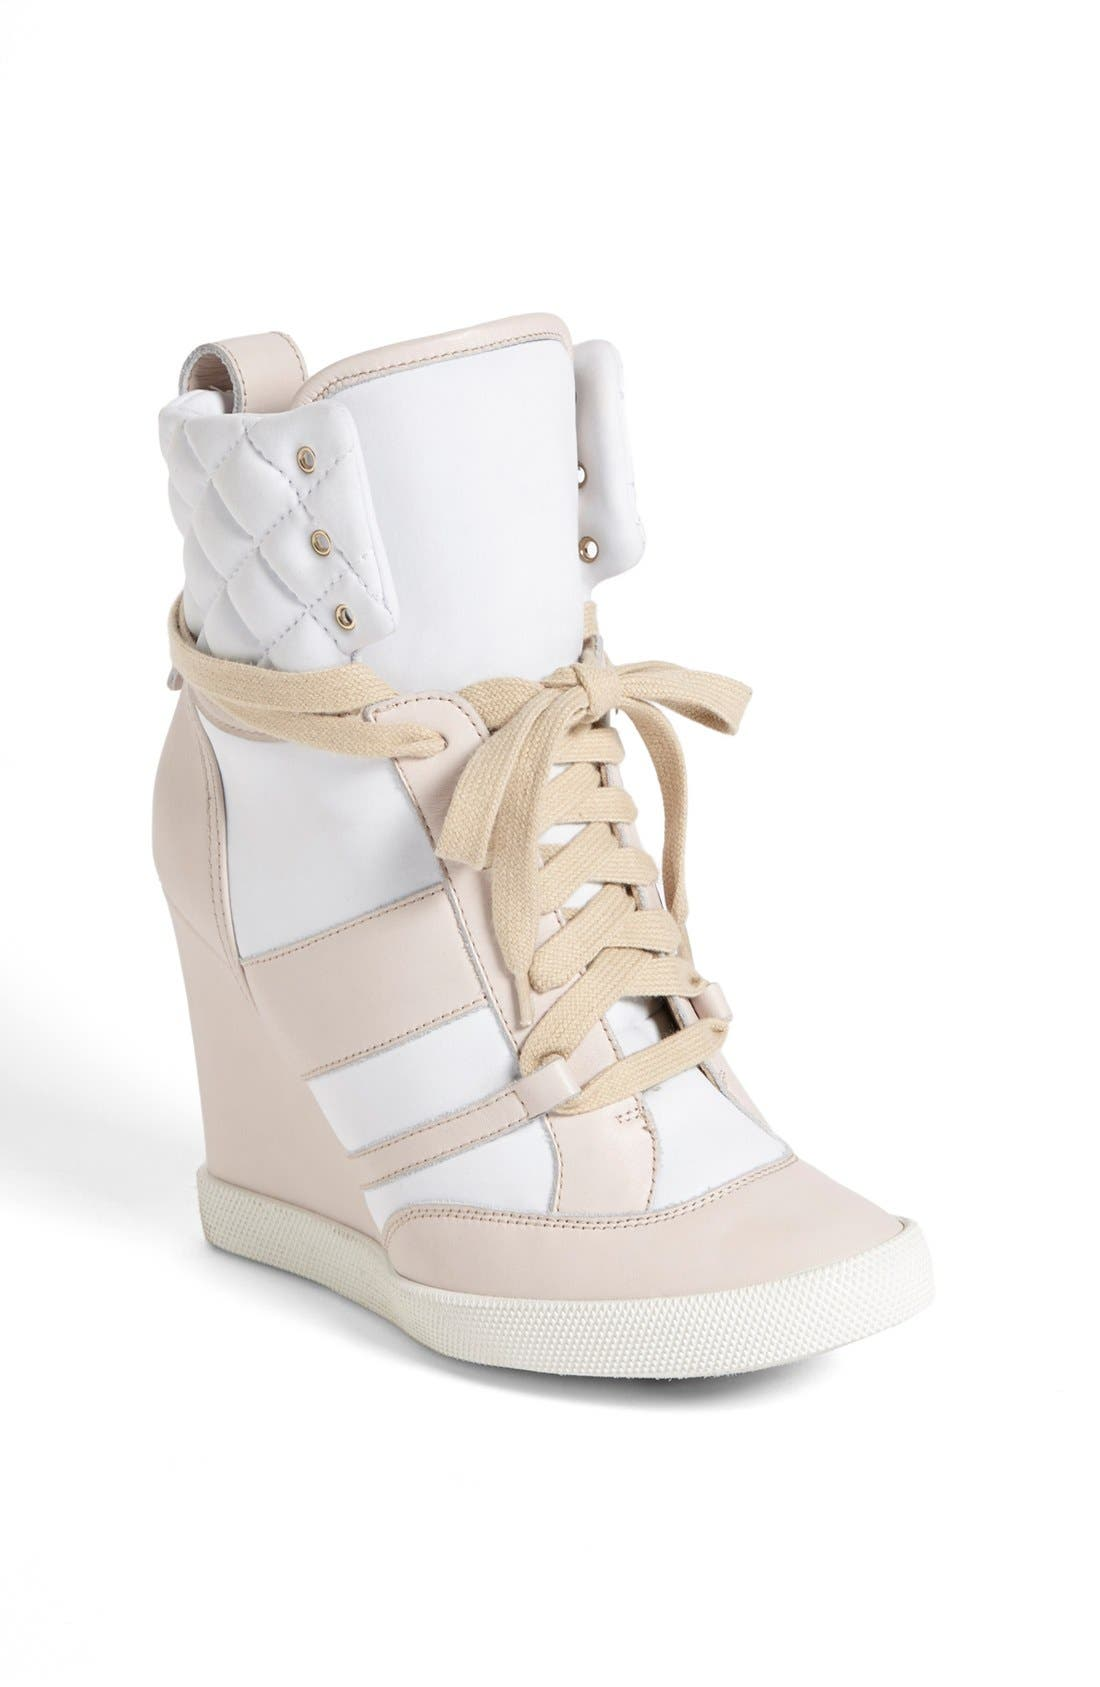 Main Image - Chloé 'Kasia' Wedge Sneaker